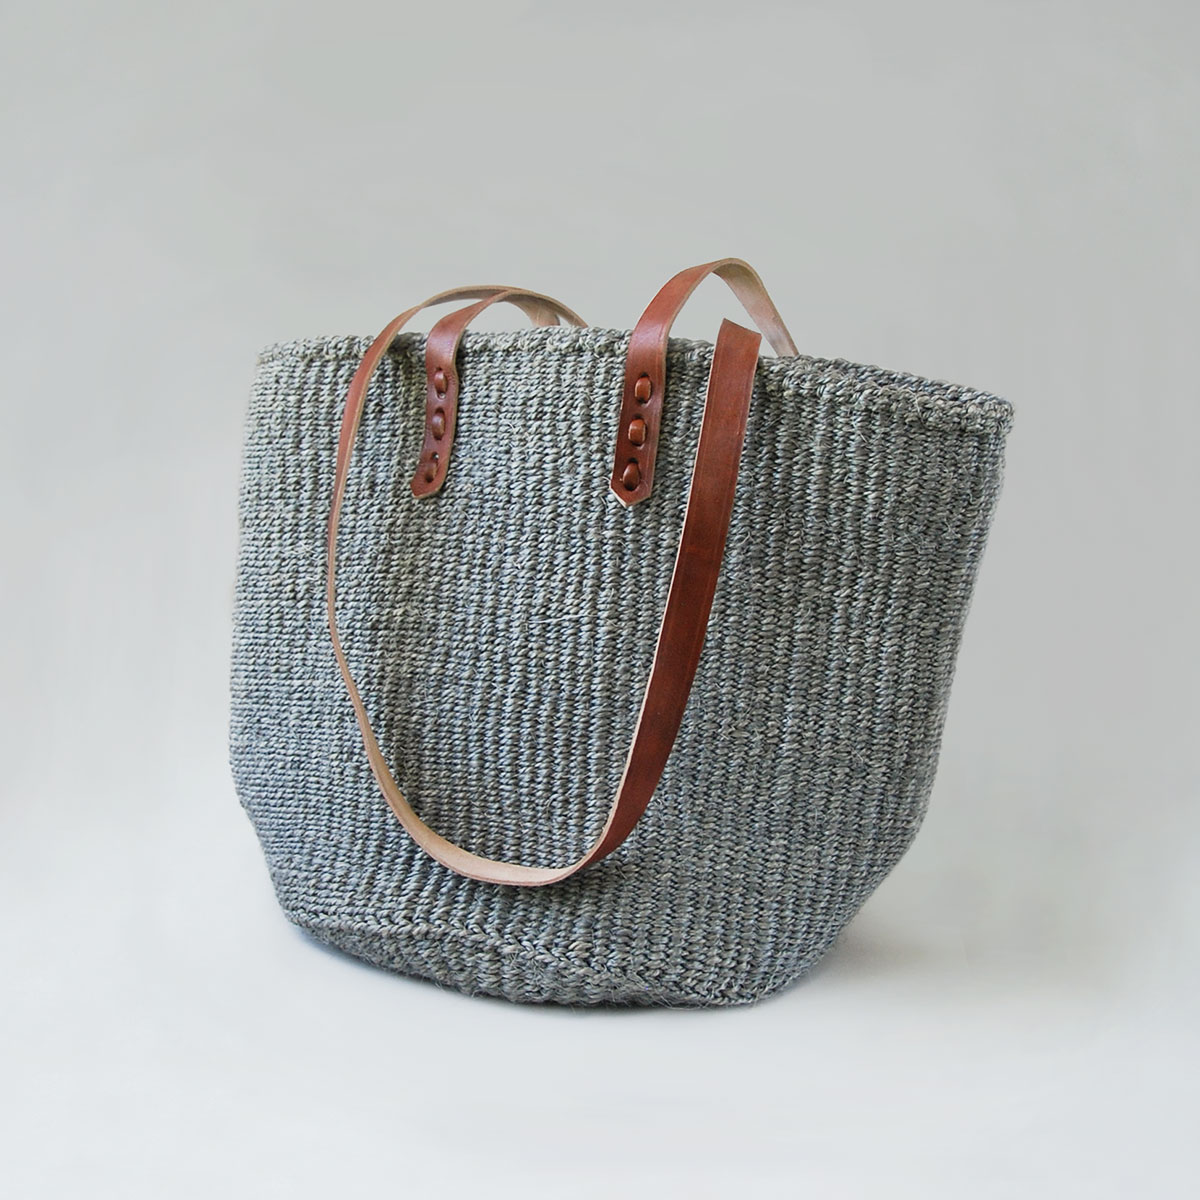 Grey-sisal-tote-dark-leather